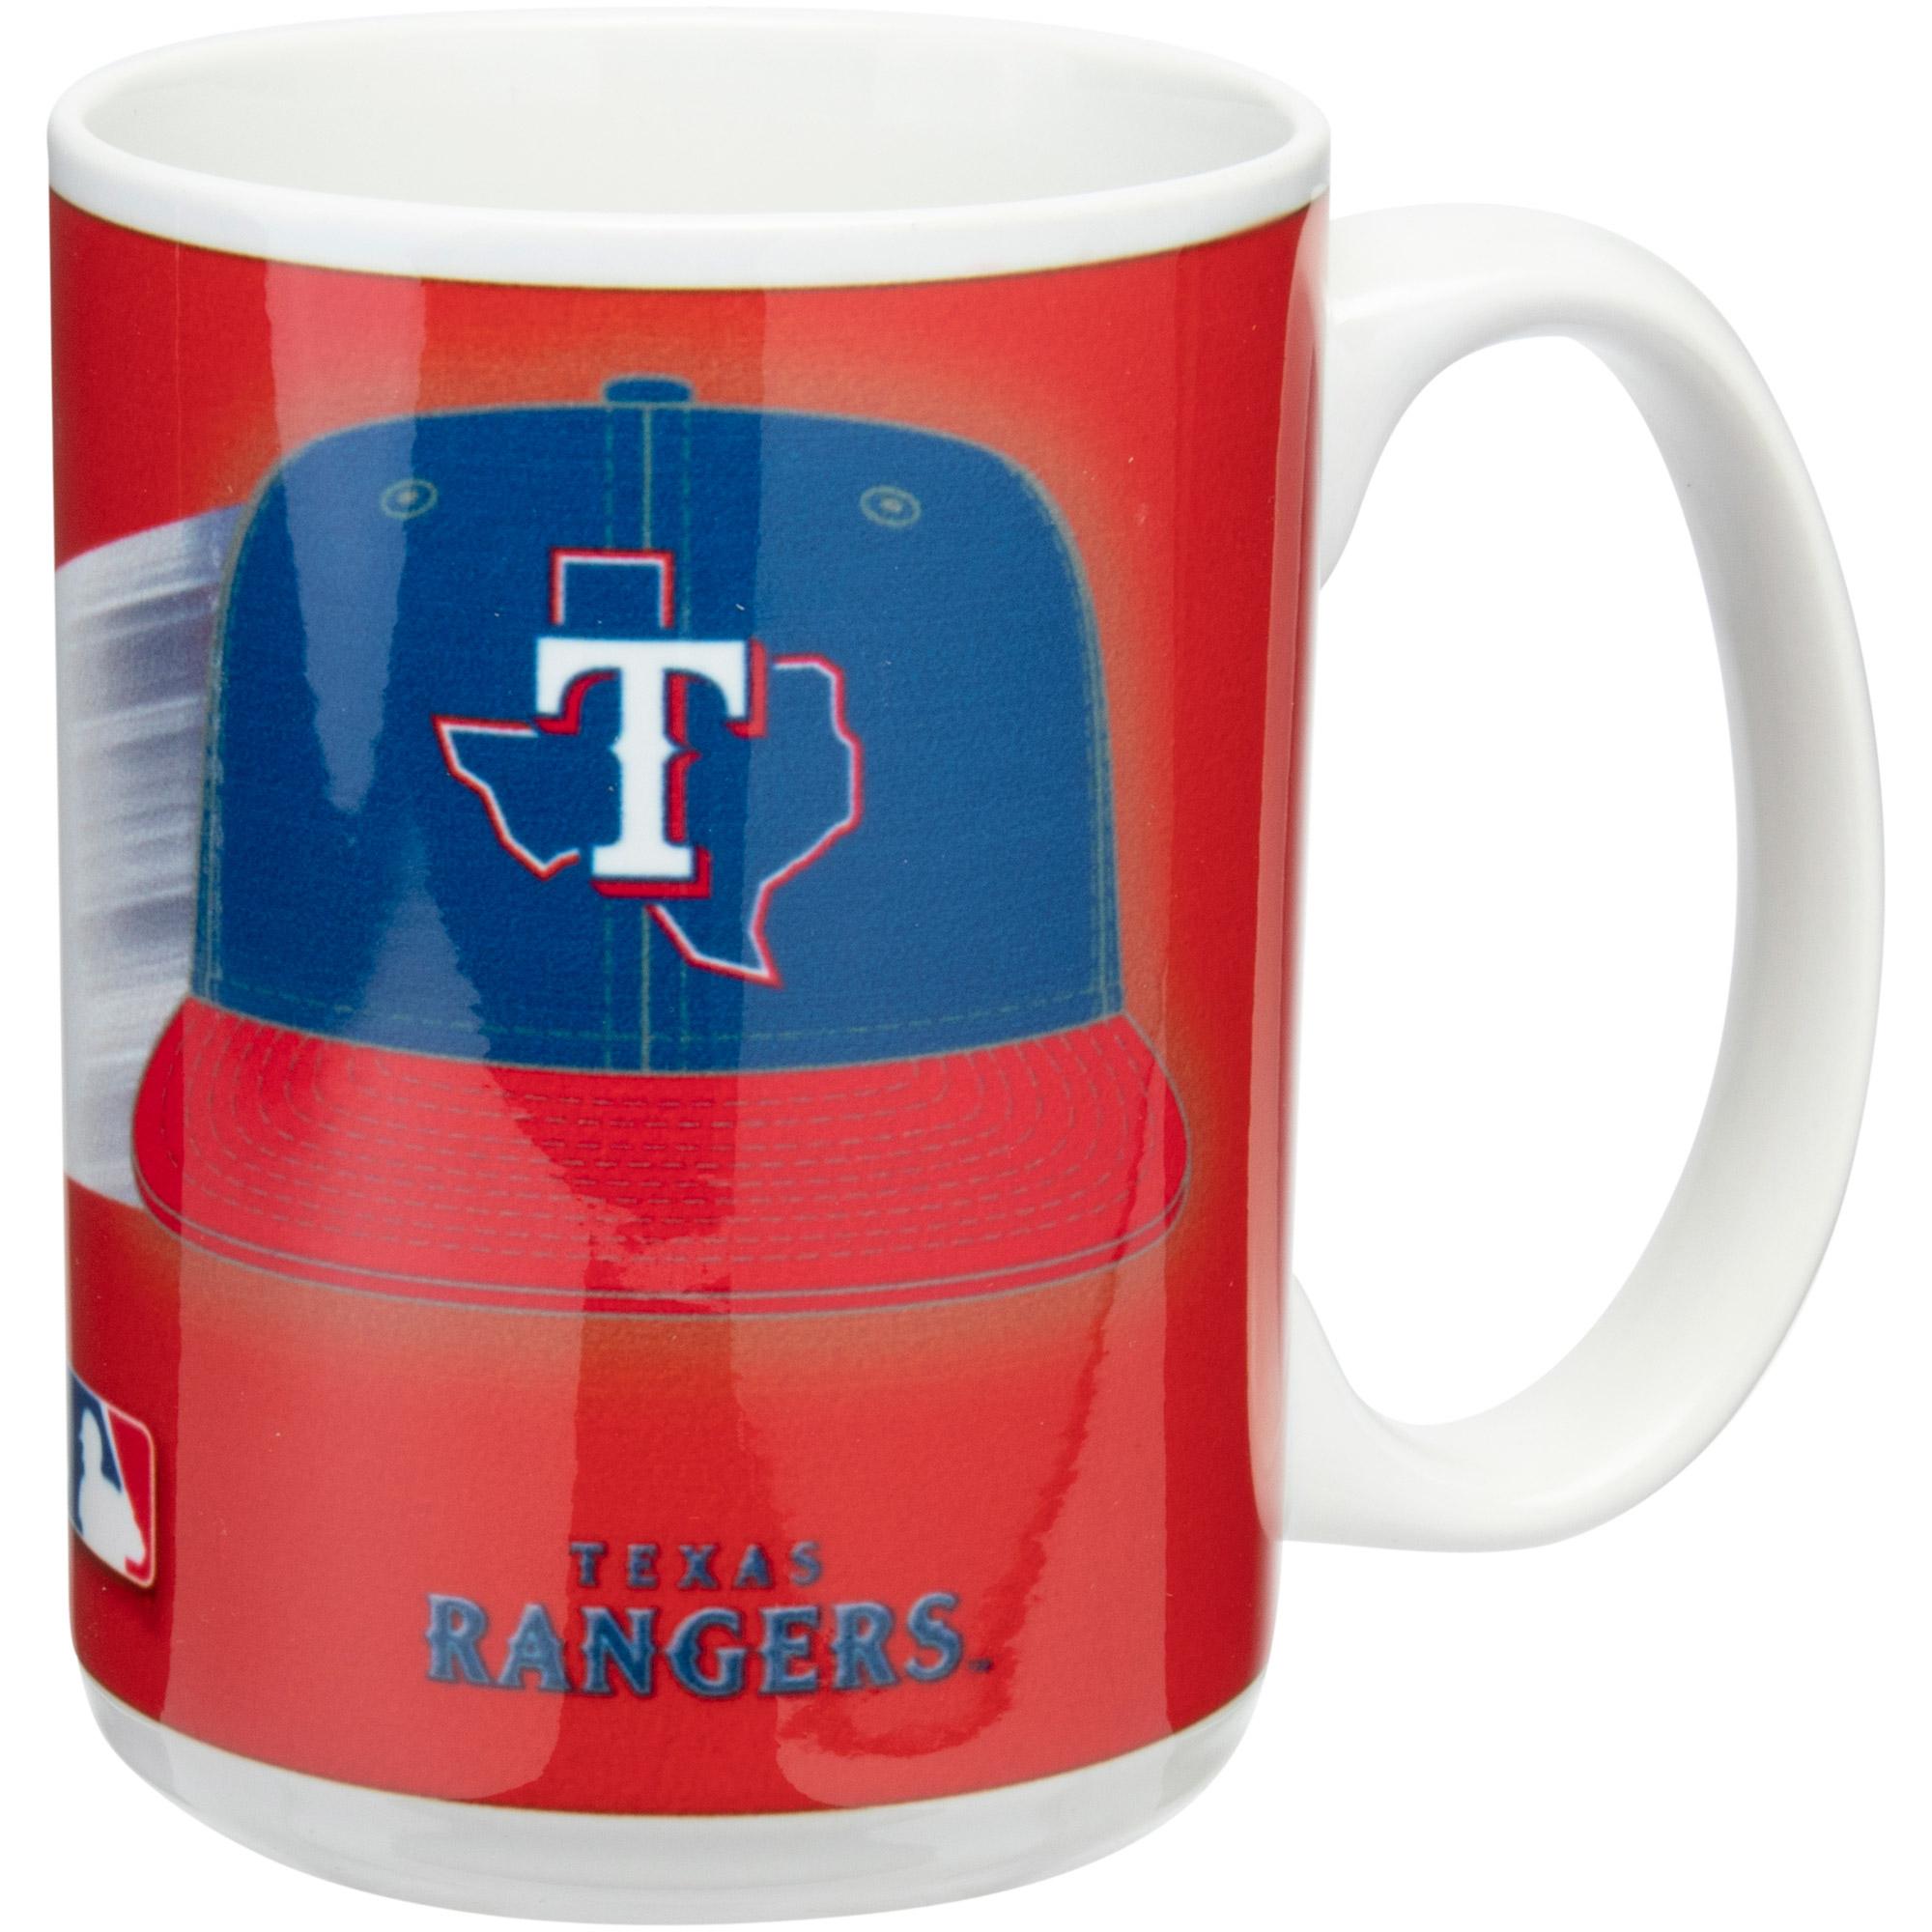 Texas Rangers 15oz. Team 3D Graphic Mug - No Size